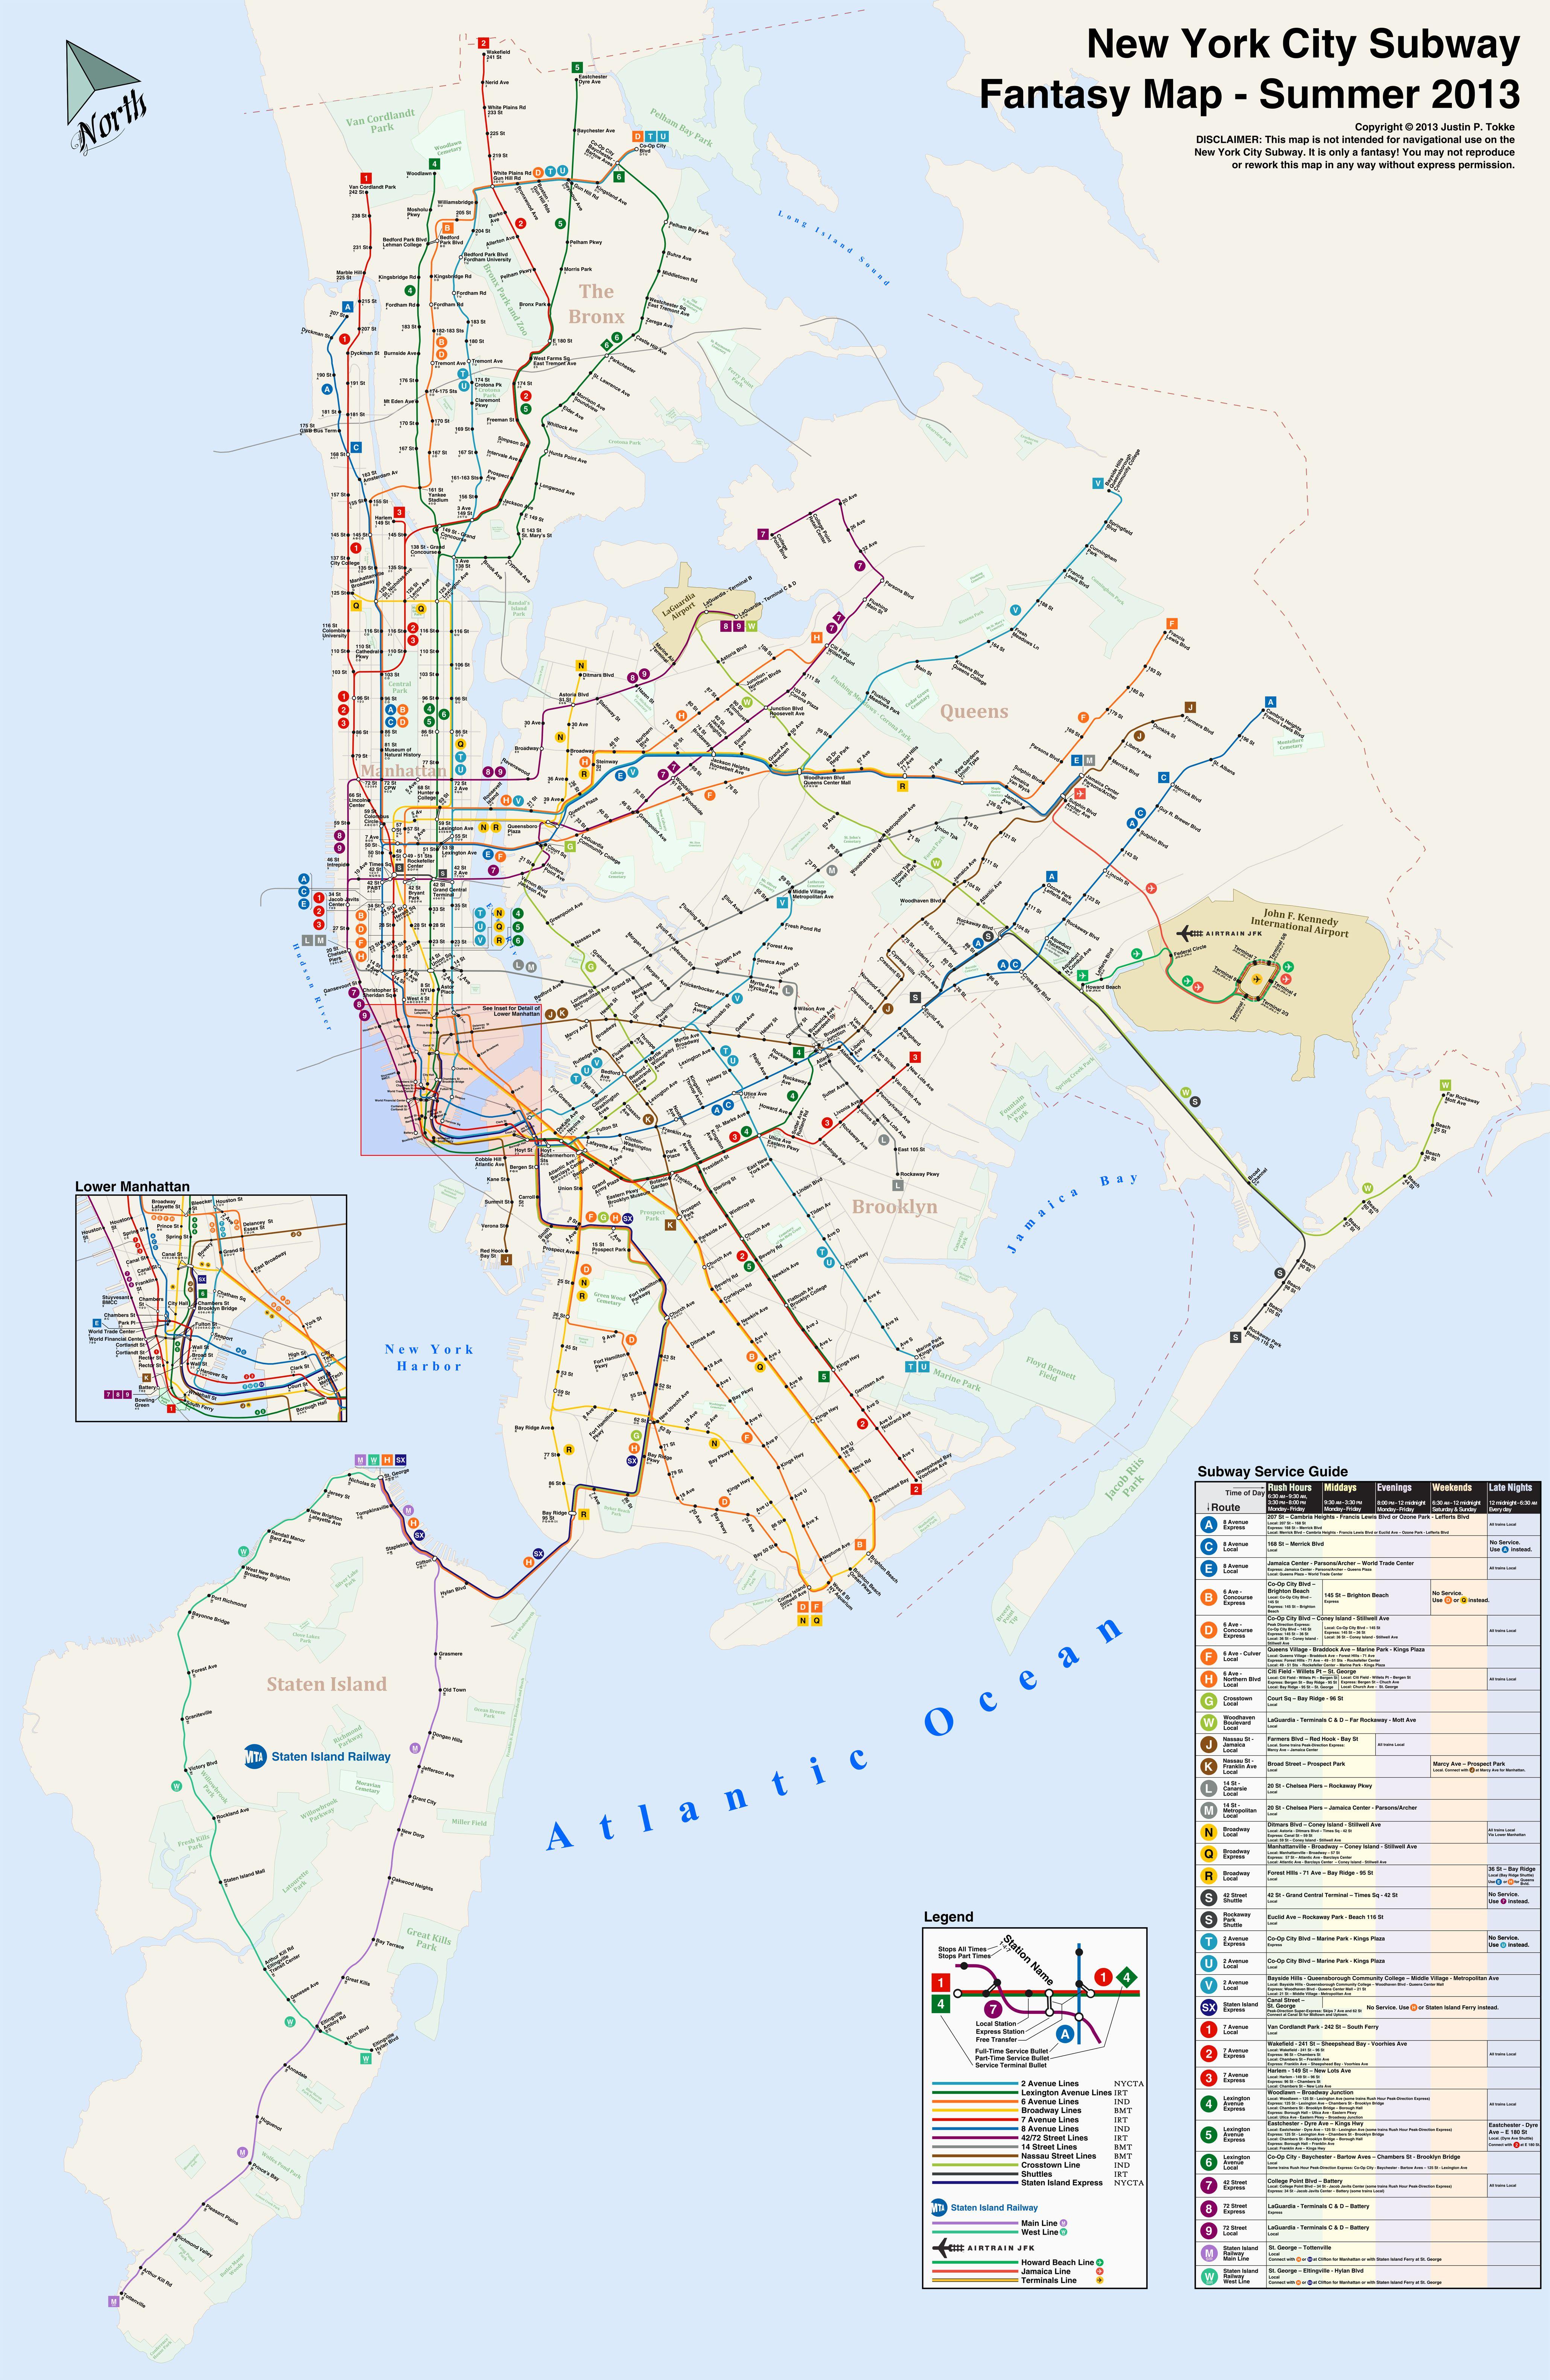 Fantasy New York Subway Map.Subway Fantasy Map 2013 Edition New York City Transit Fantasy